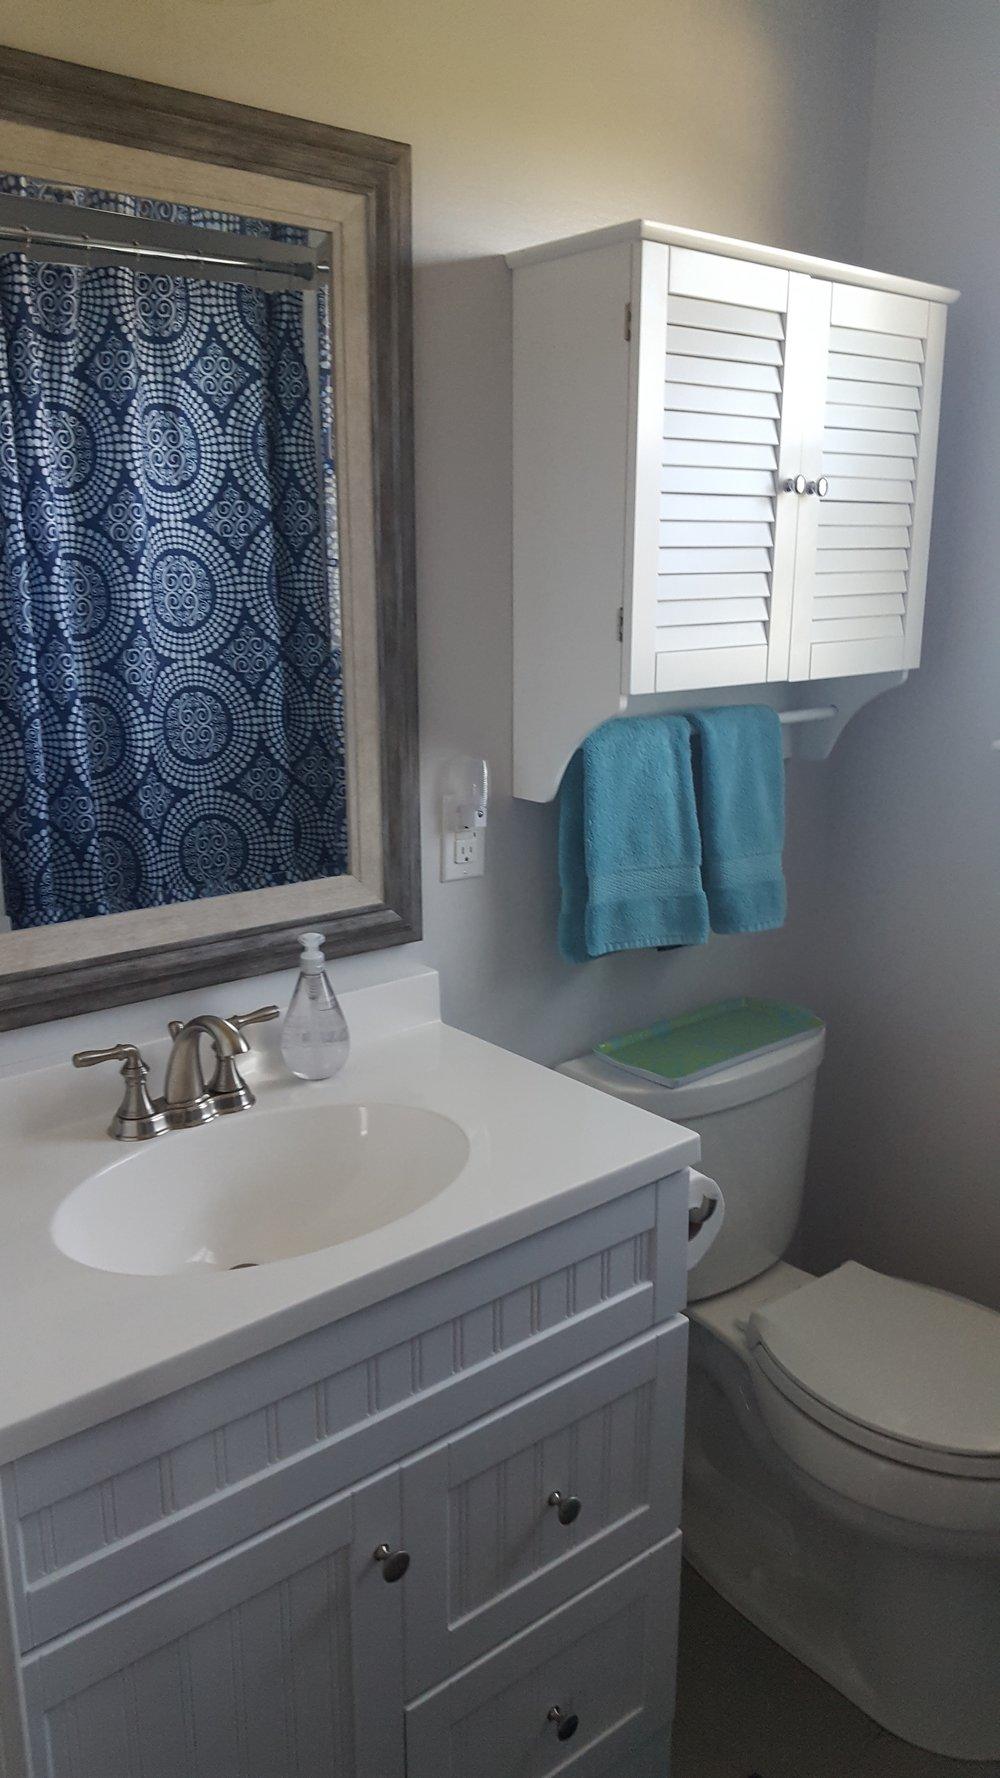 Lands End Condo at Scarborough Beach Master Bathroom 1.jpg